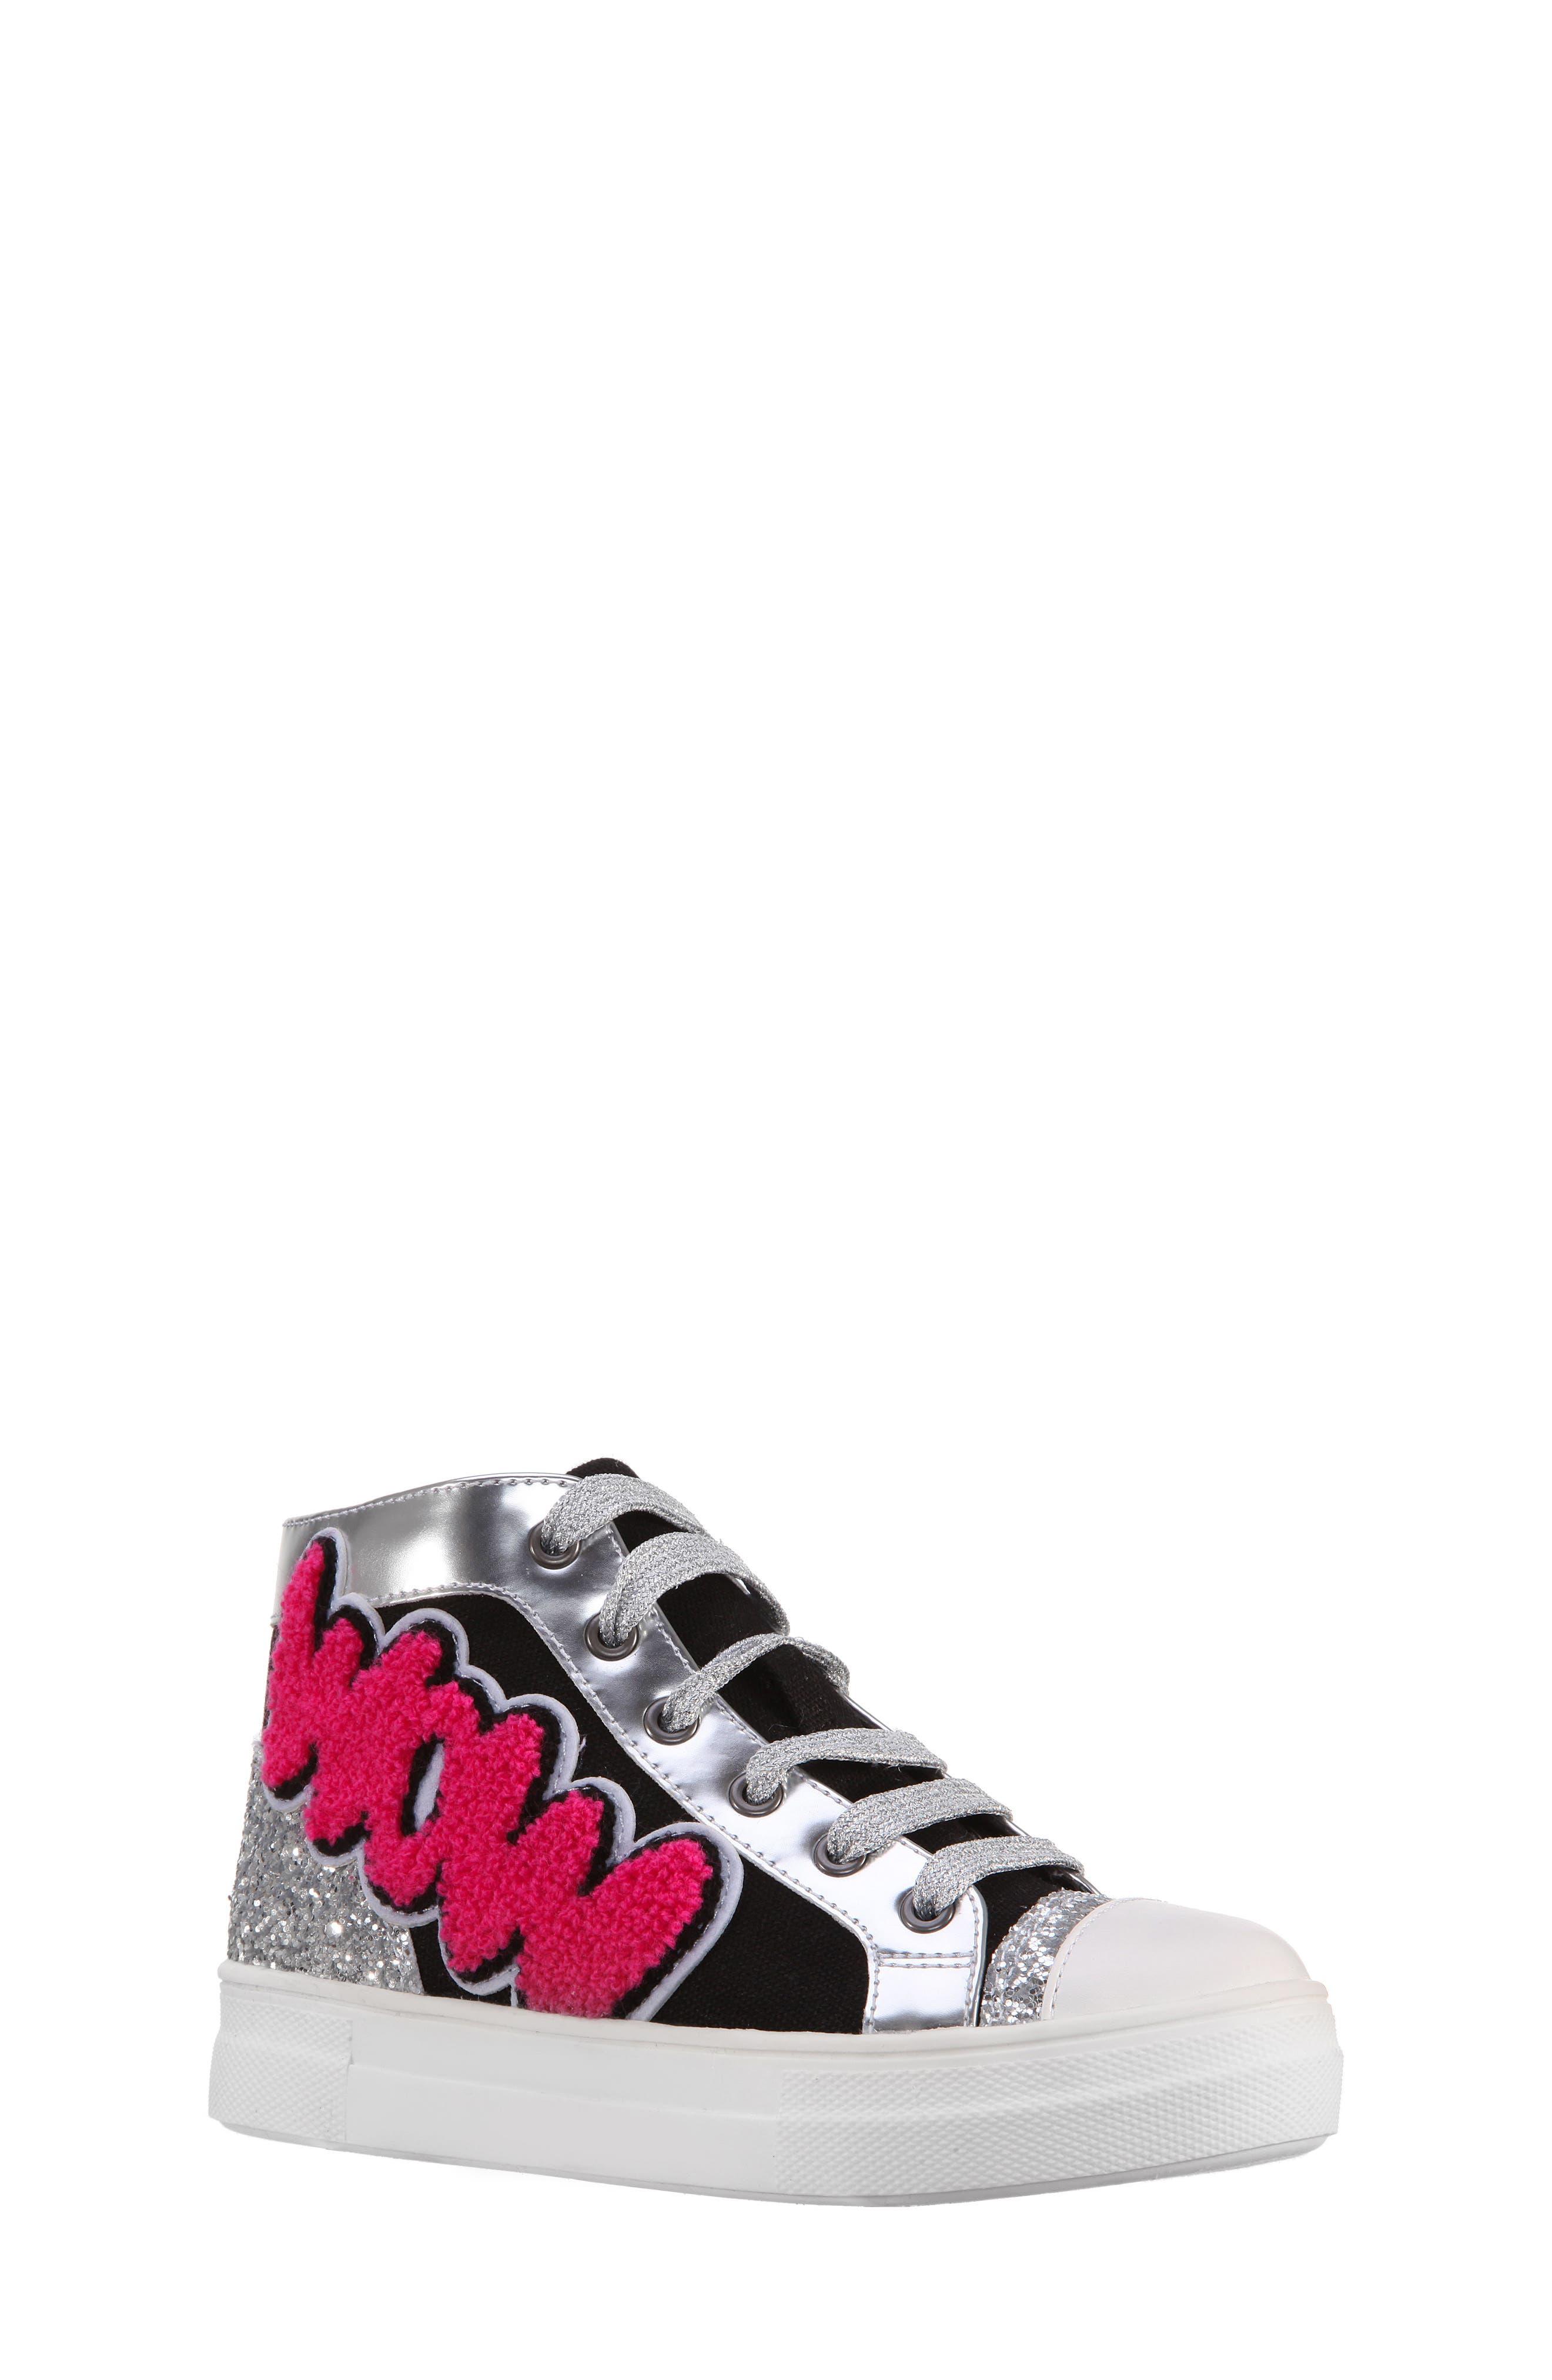 Gita High Top Sneaker,                             Main thumbnail 1, color,                             009